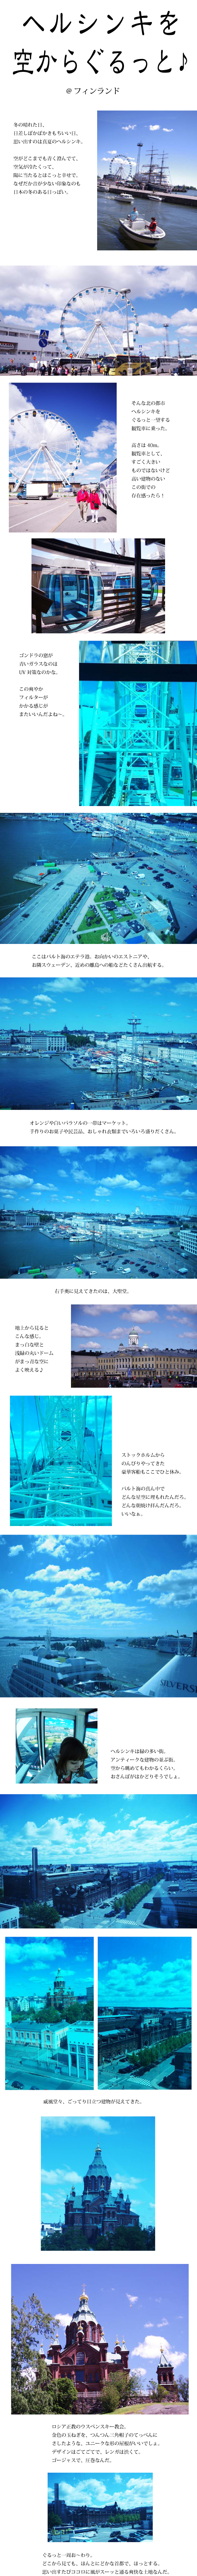 tomako160205.jpg